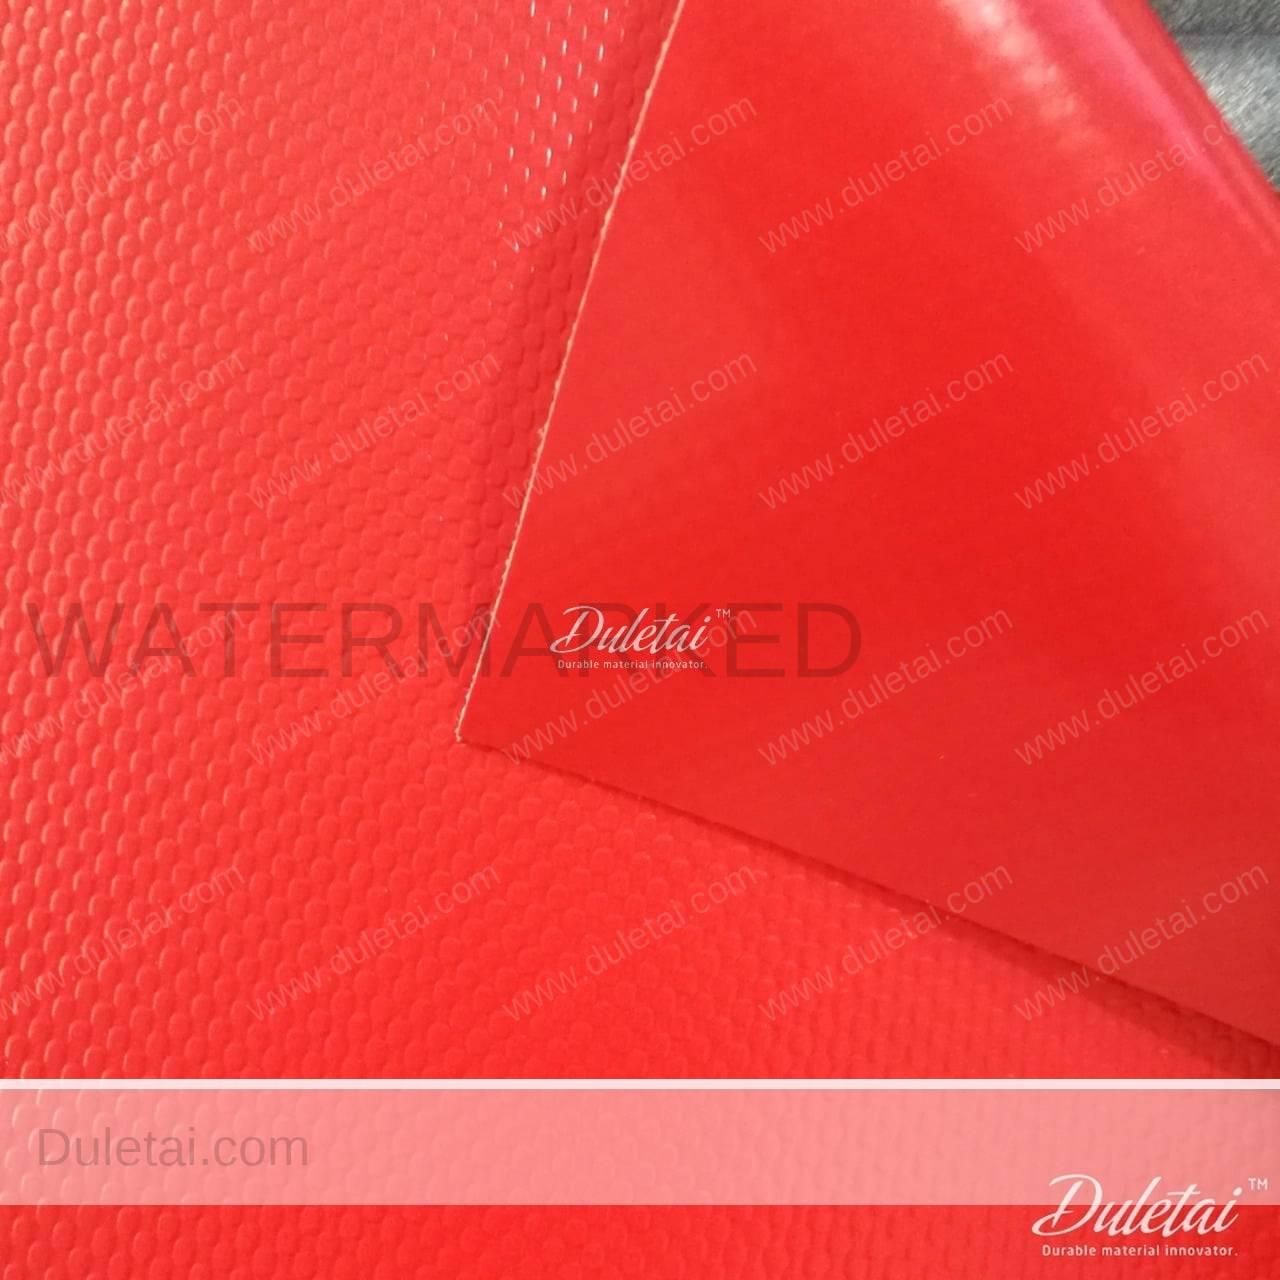 Acrylic Larquered Tarpaulin Pvc Sliding Doors Material